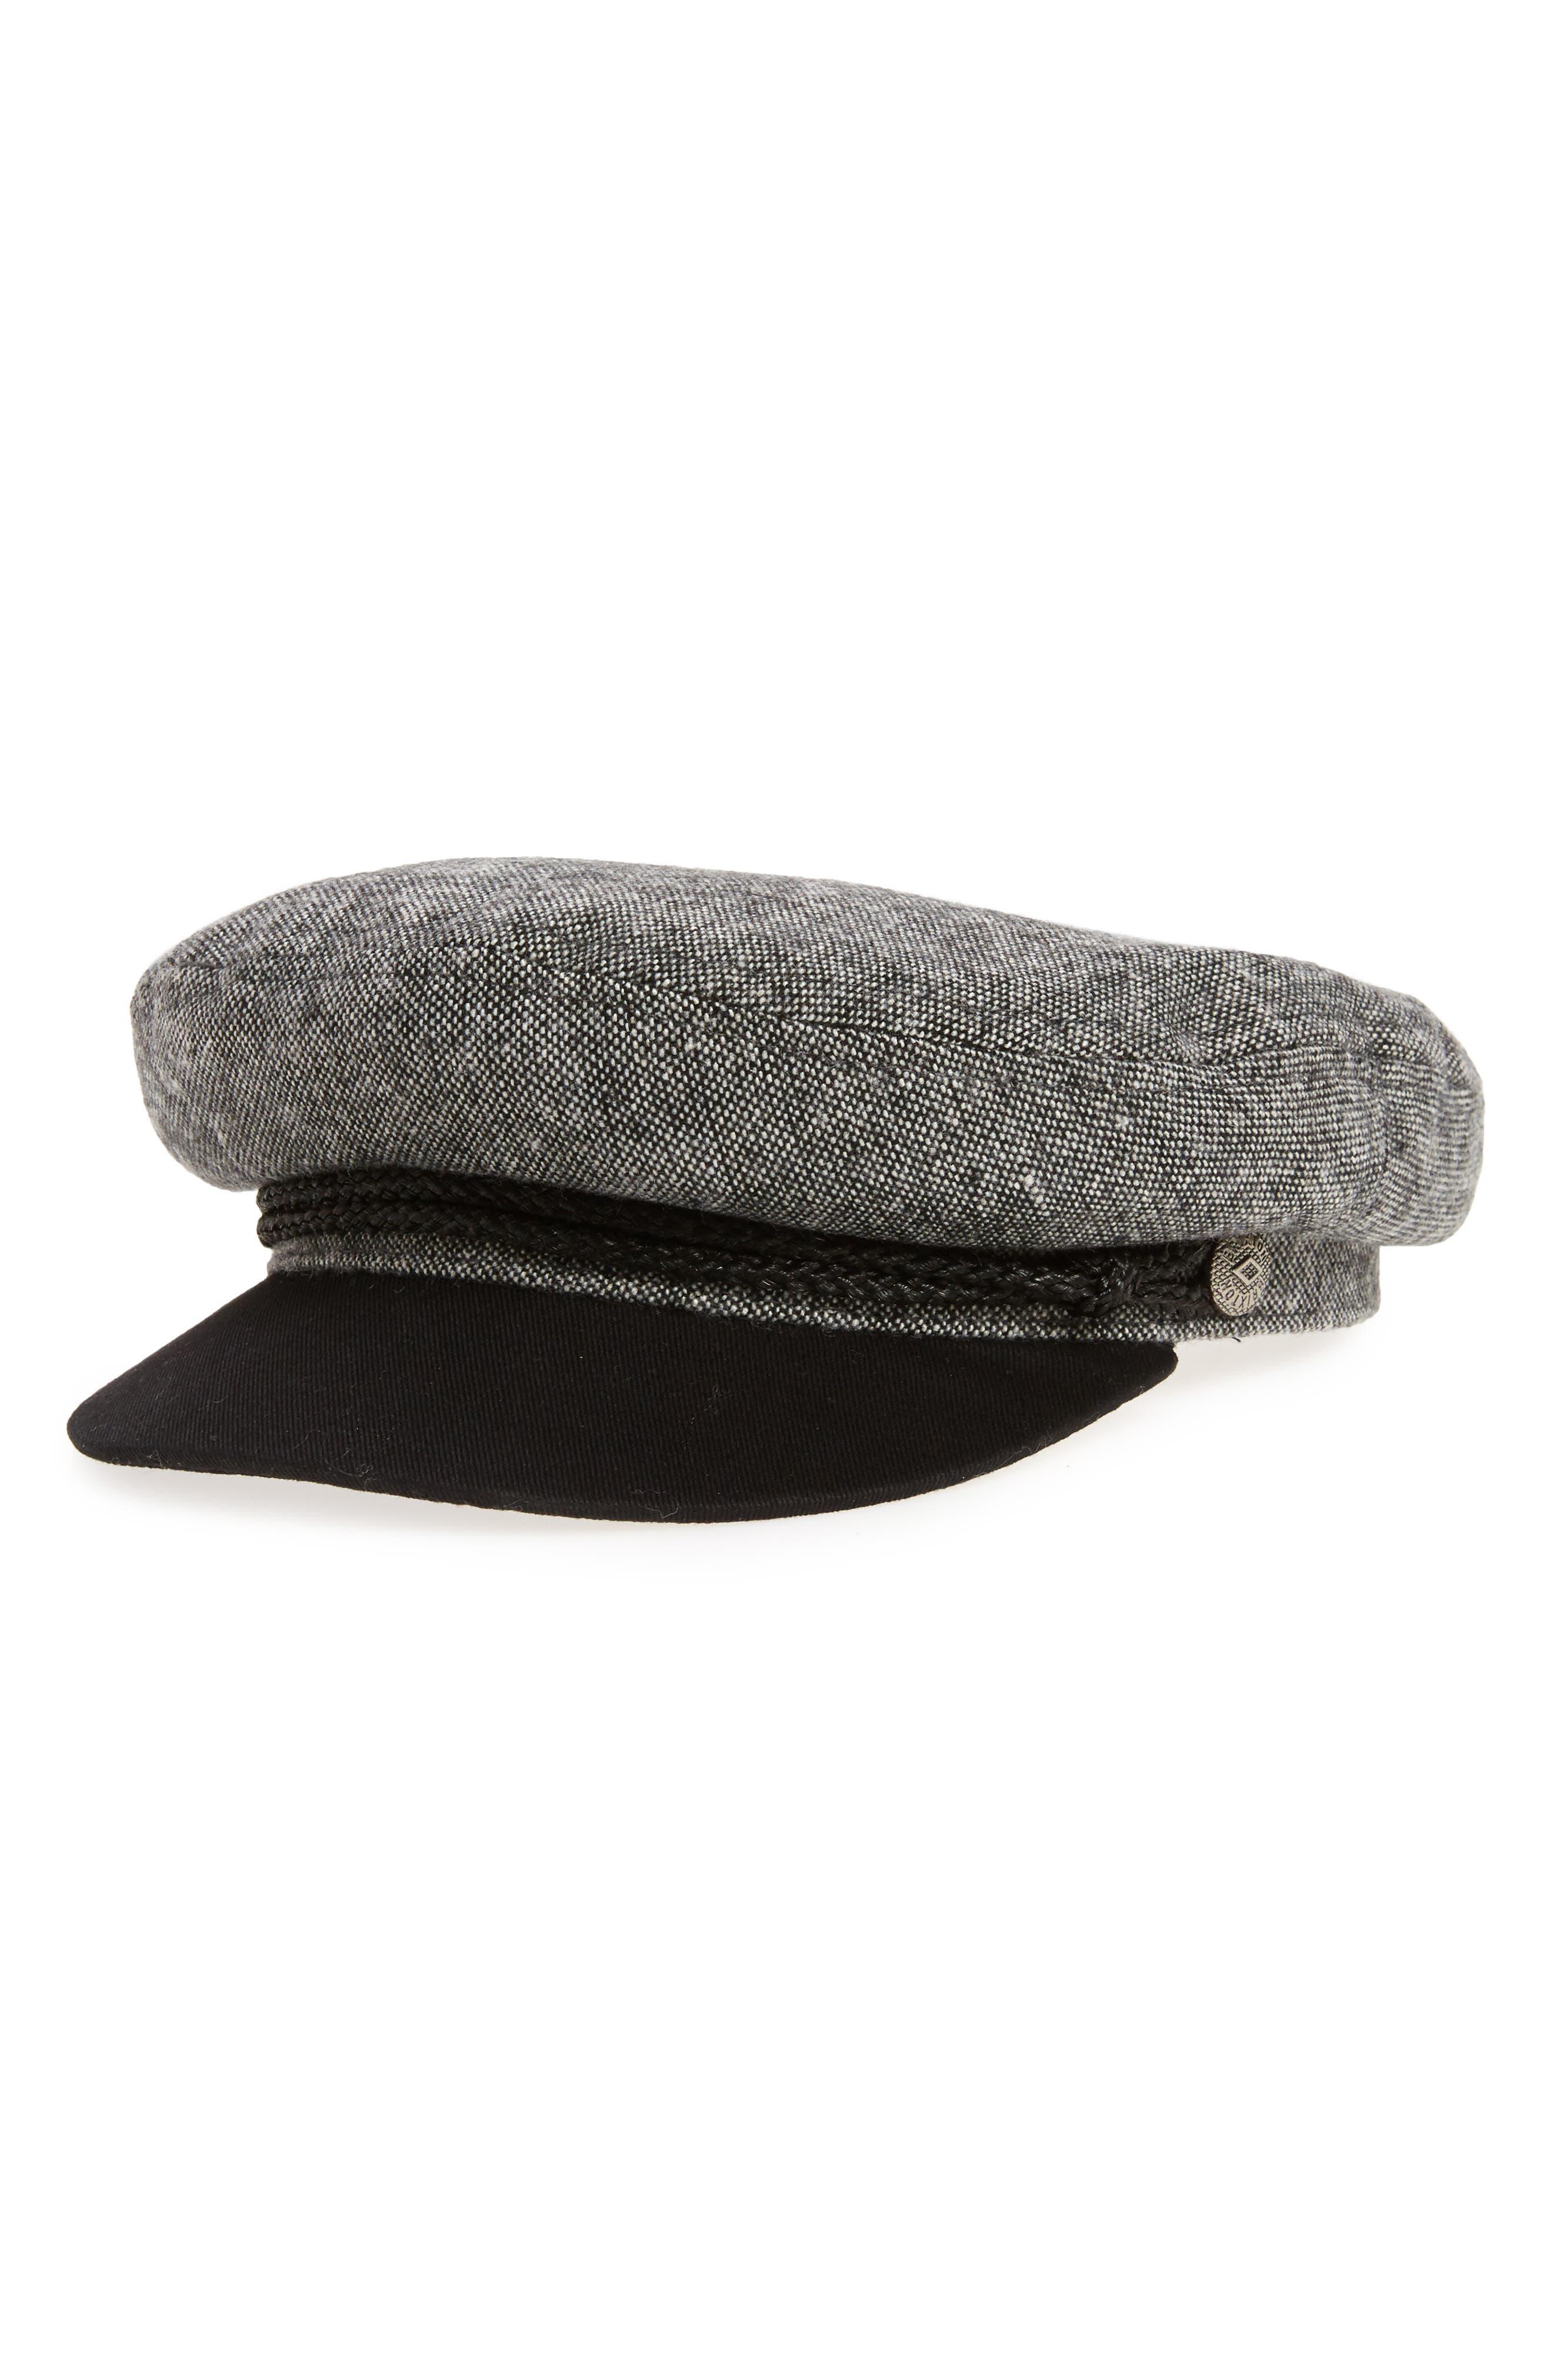 Fiddler Cap,                         Main,                         color, BLACK/ WHITE TWEED